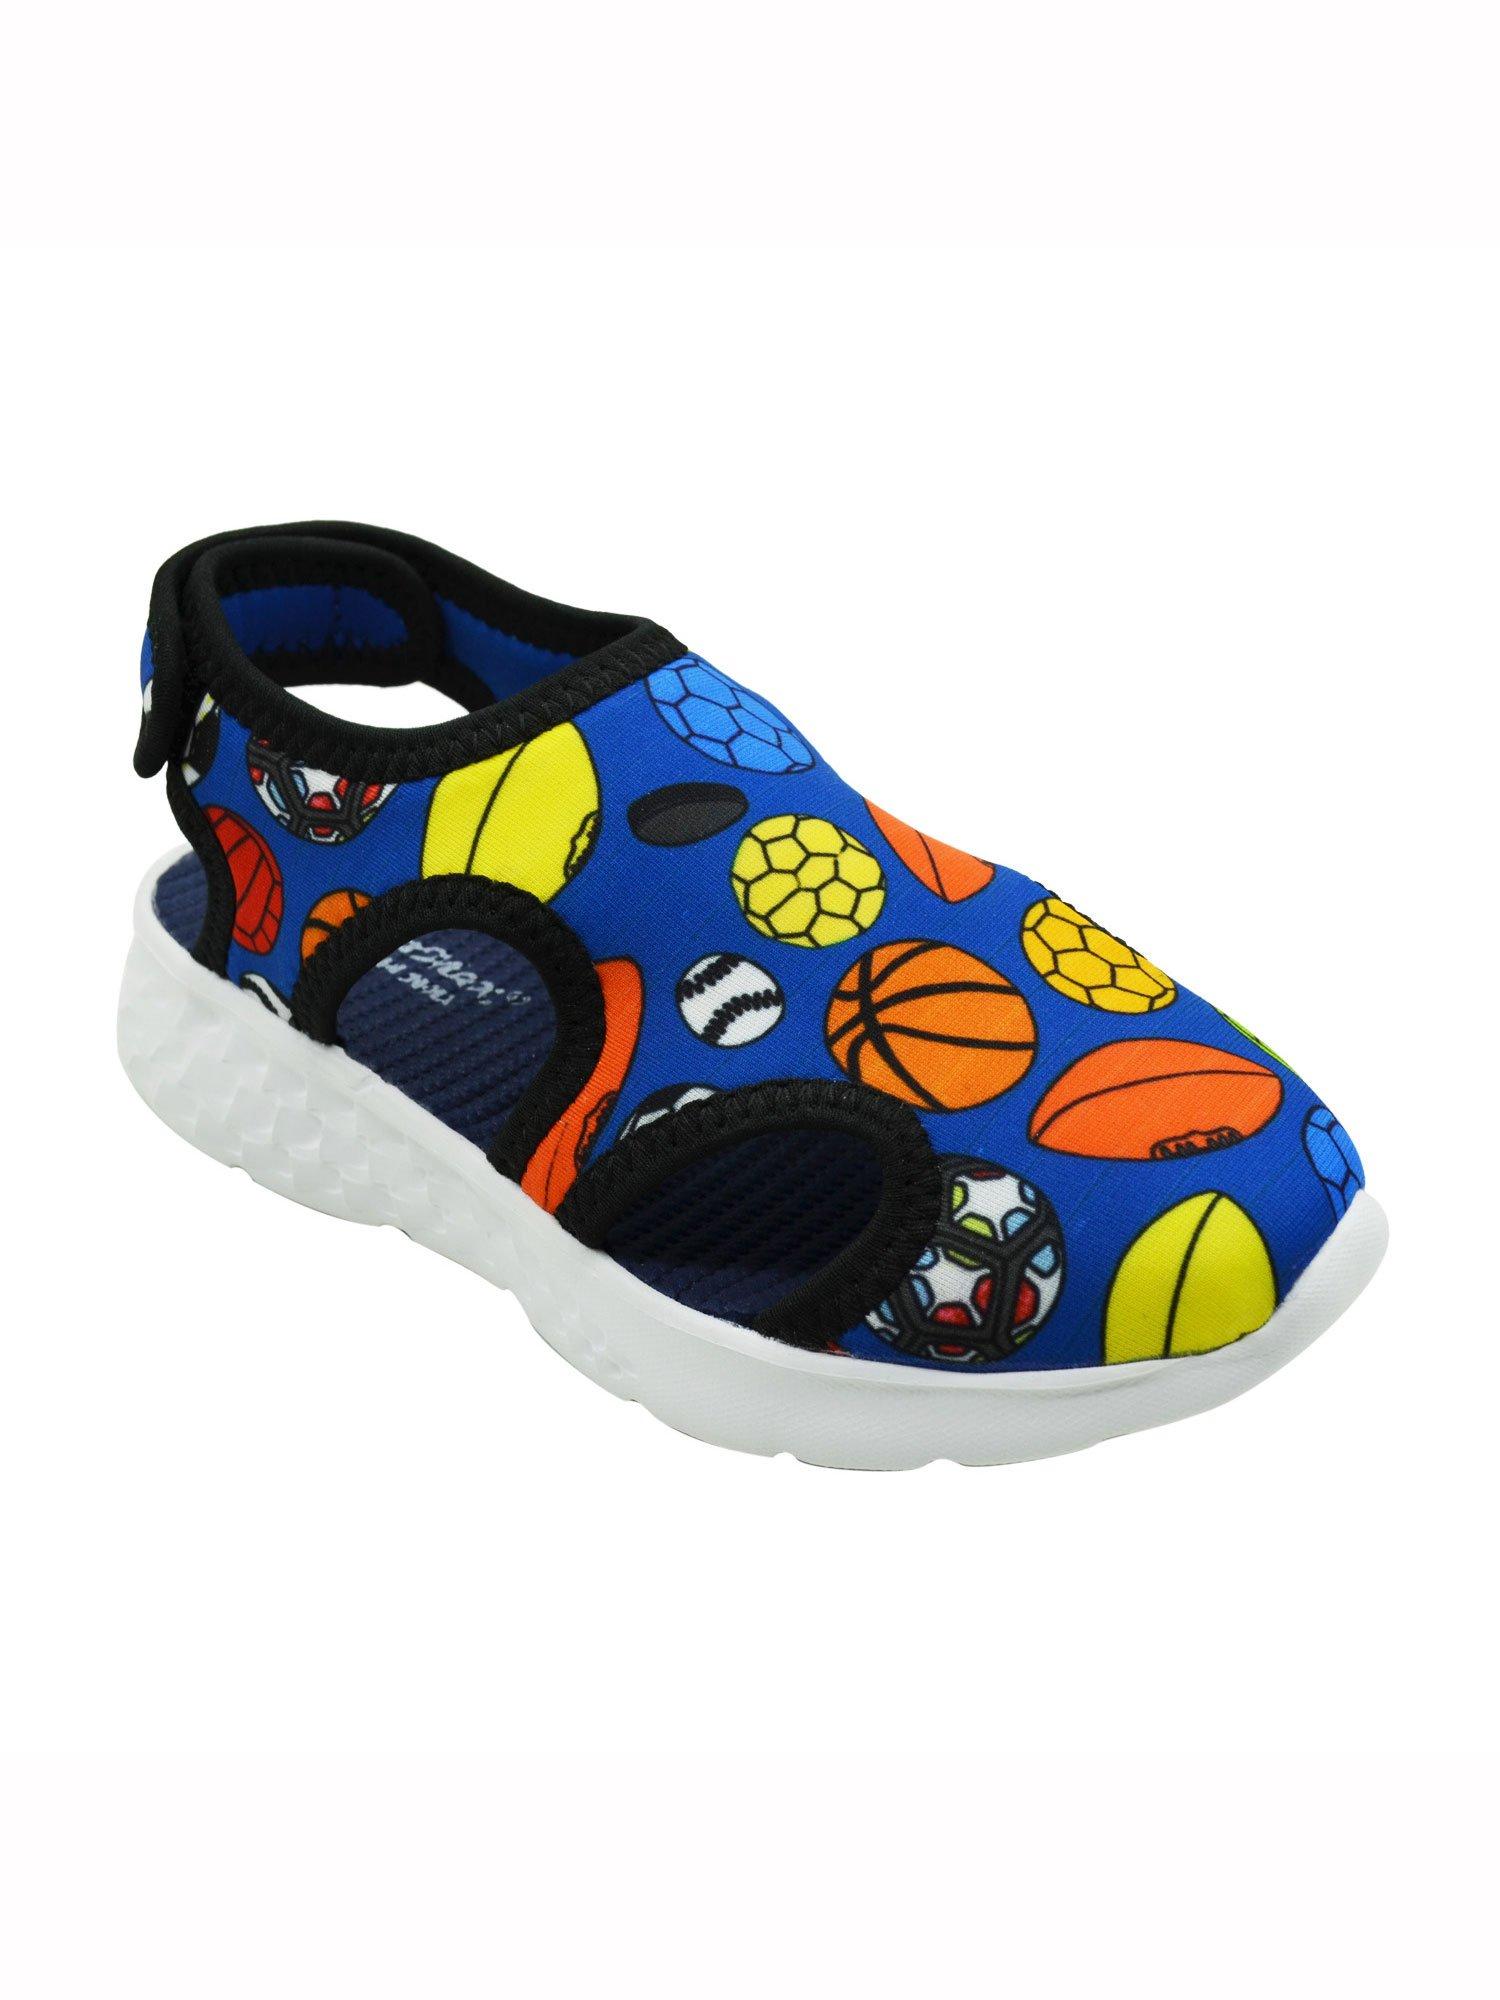 Buy KazarMax Blue Printed Sandals